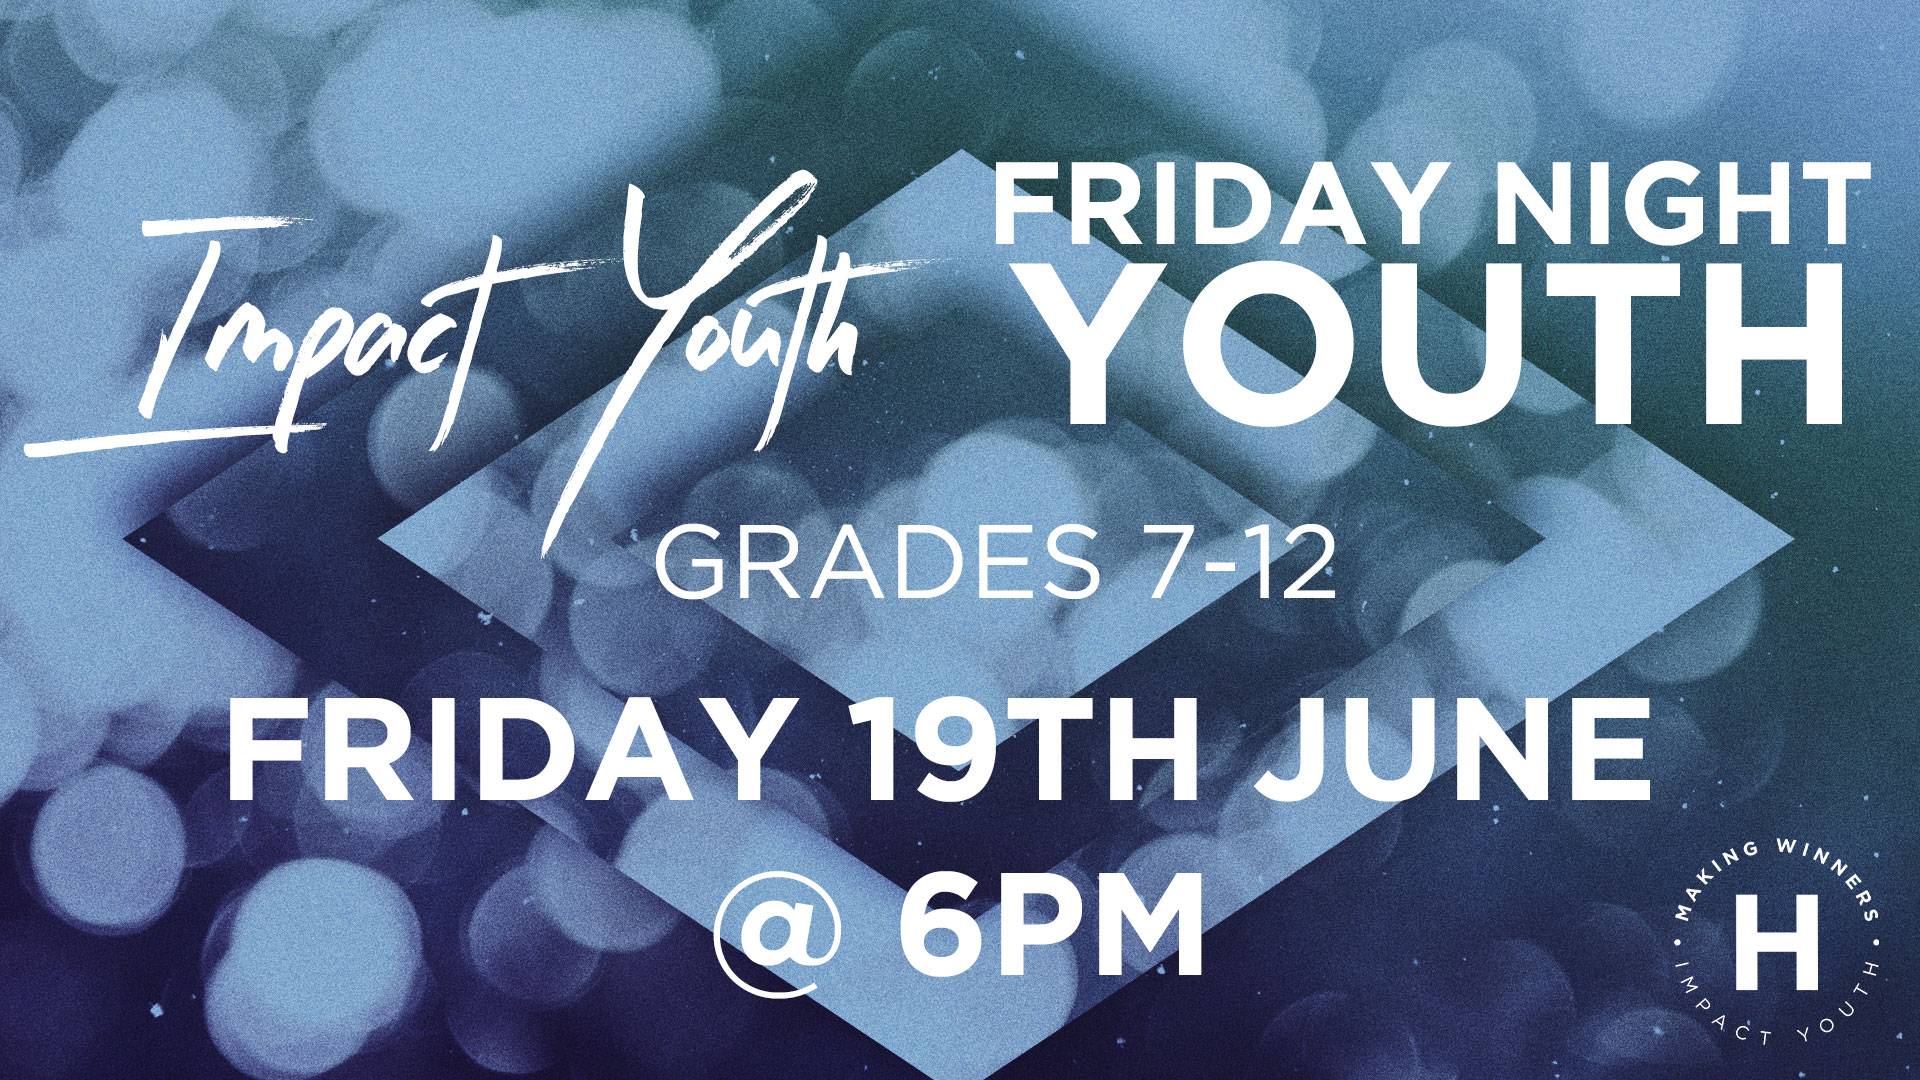 Impact Friday Night Youth